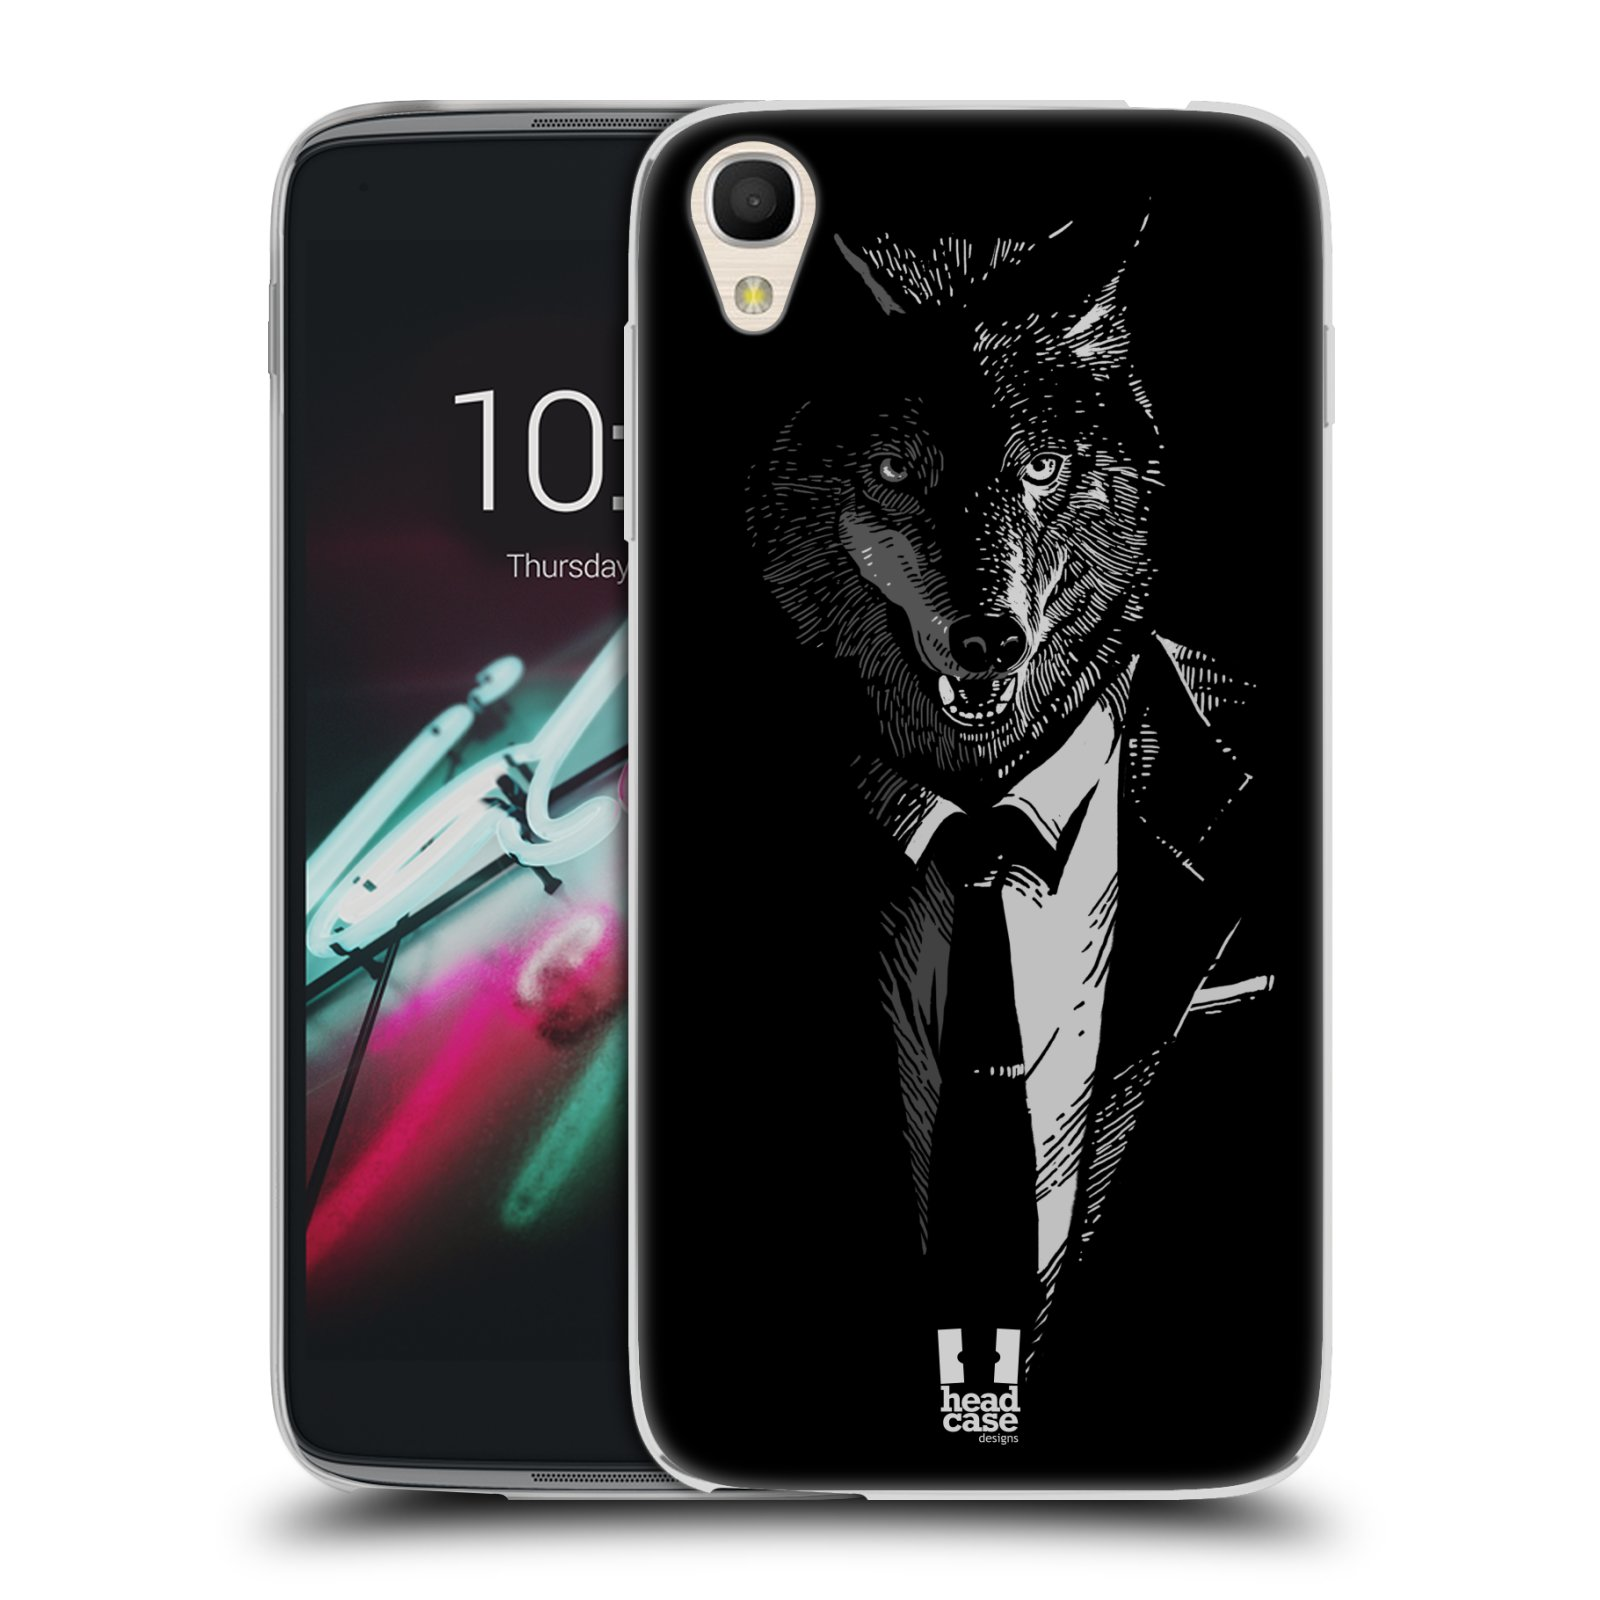 HEAD CASE silikonový obal na mobil Alcatel Idol 3 OT-6039Y (4.7) vzor Zvíře v obleku vlk